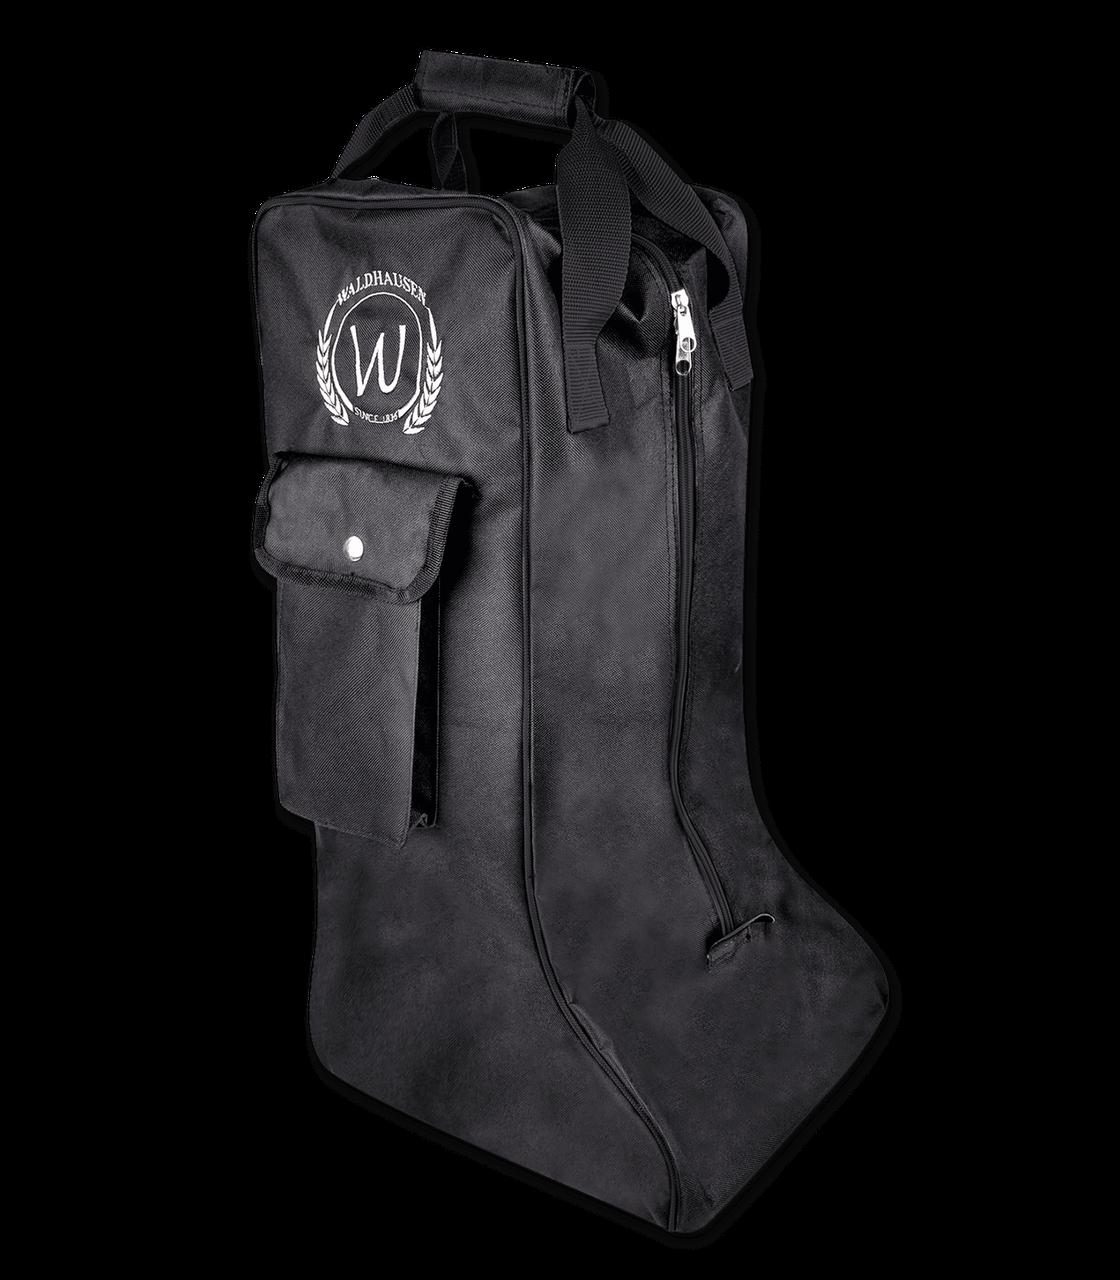 Waldhausen Deluxe Boot Bag